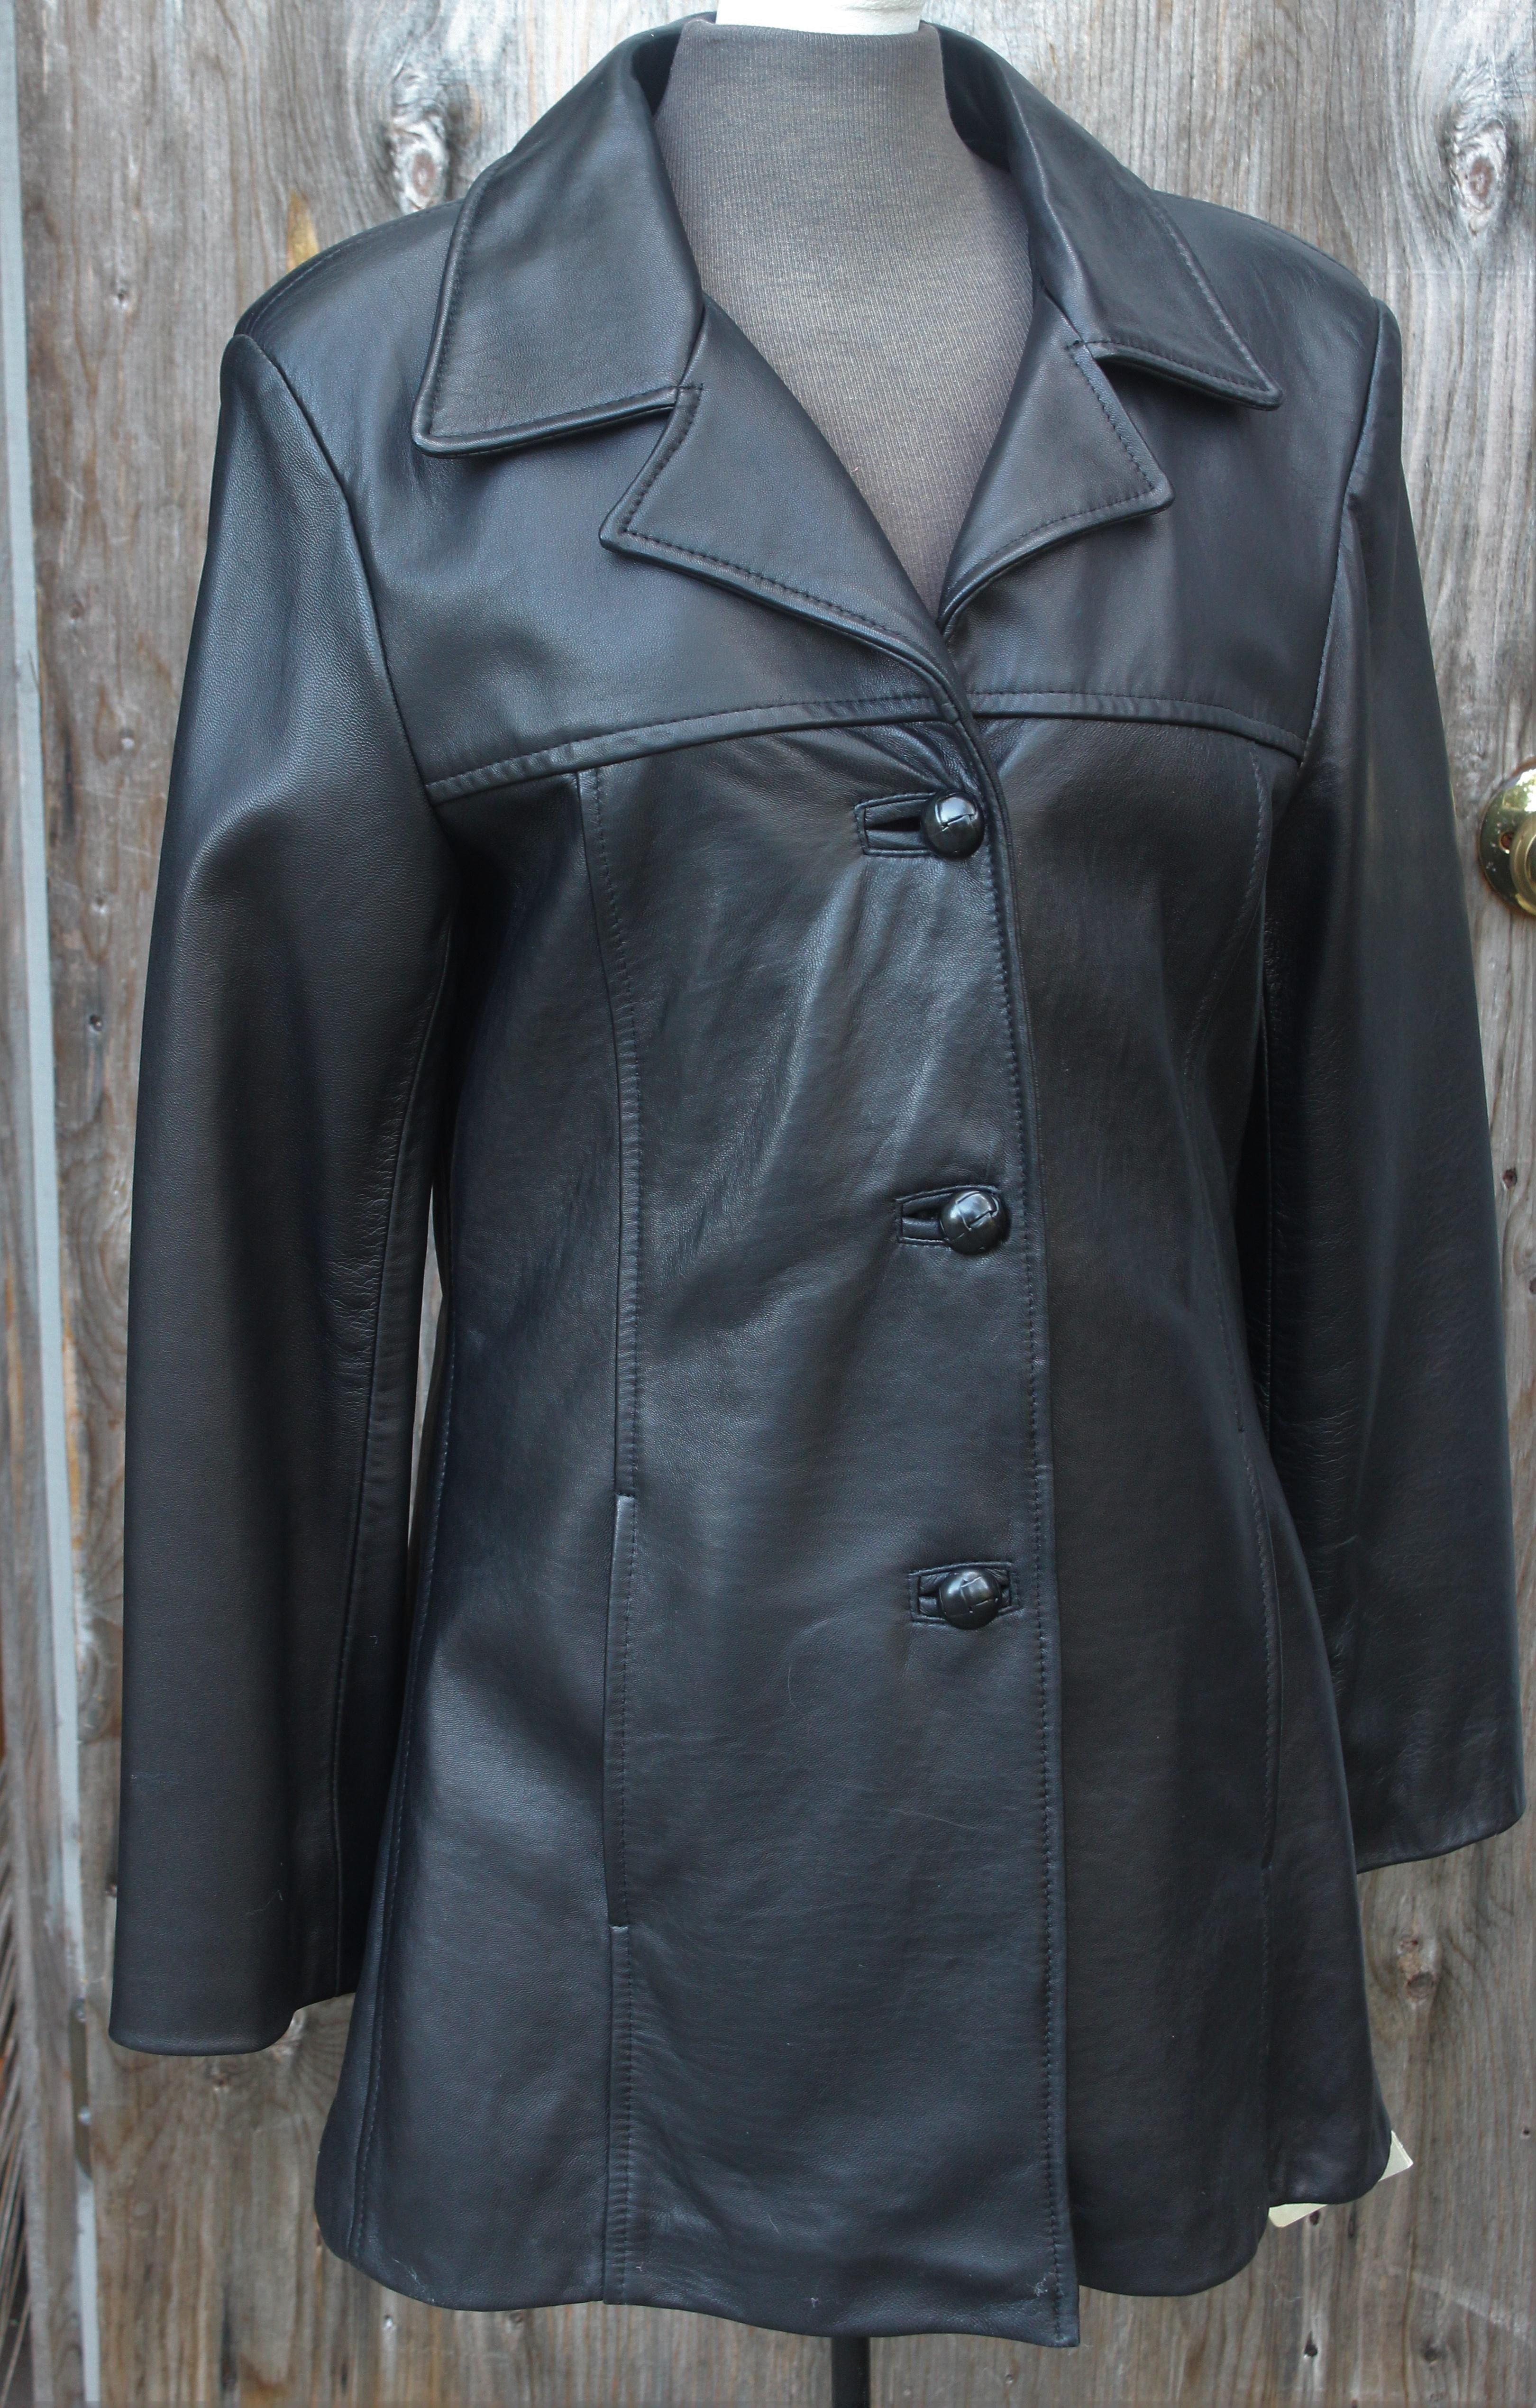 Naked Black- $365.00 Bainton's: Style #2002